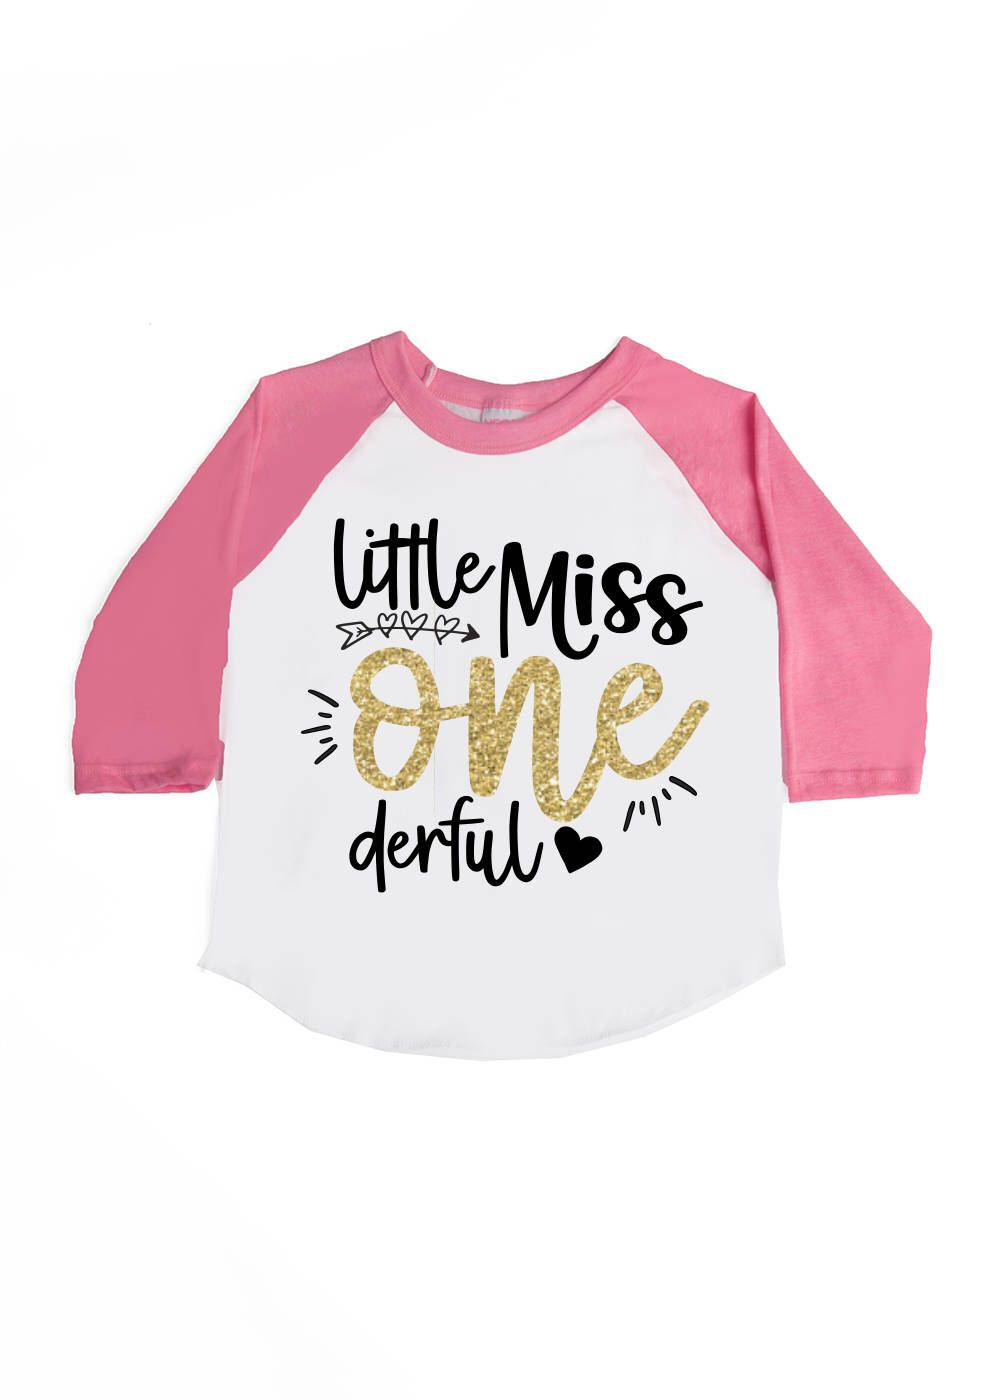 Little Miss ONE derful Shirt Girls' Birthday Shirts